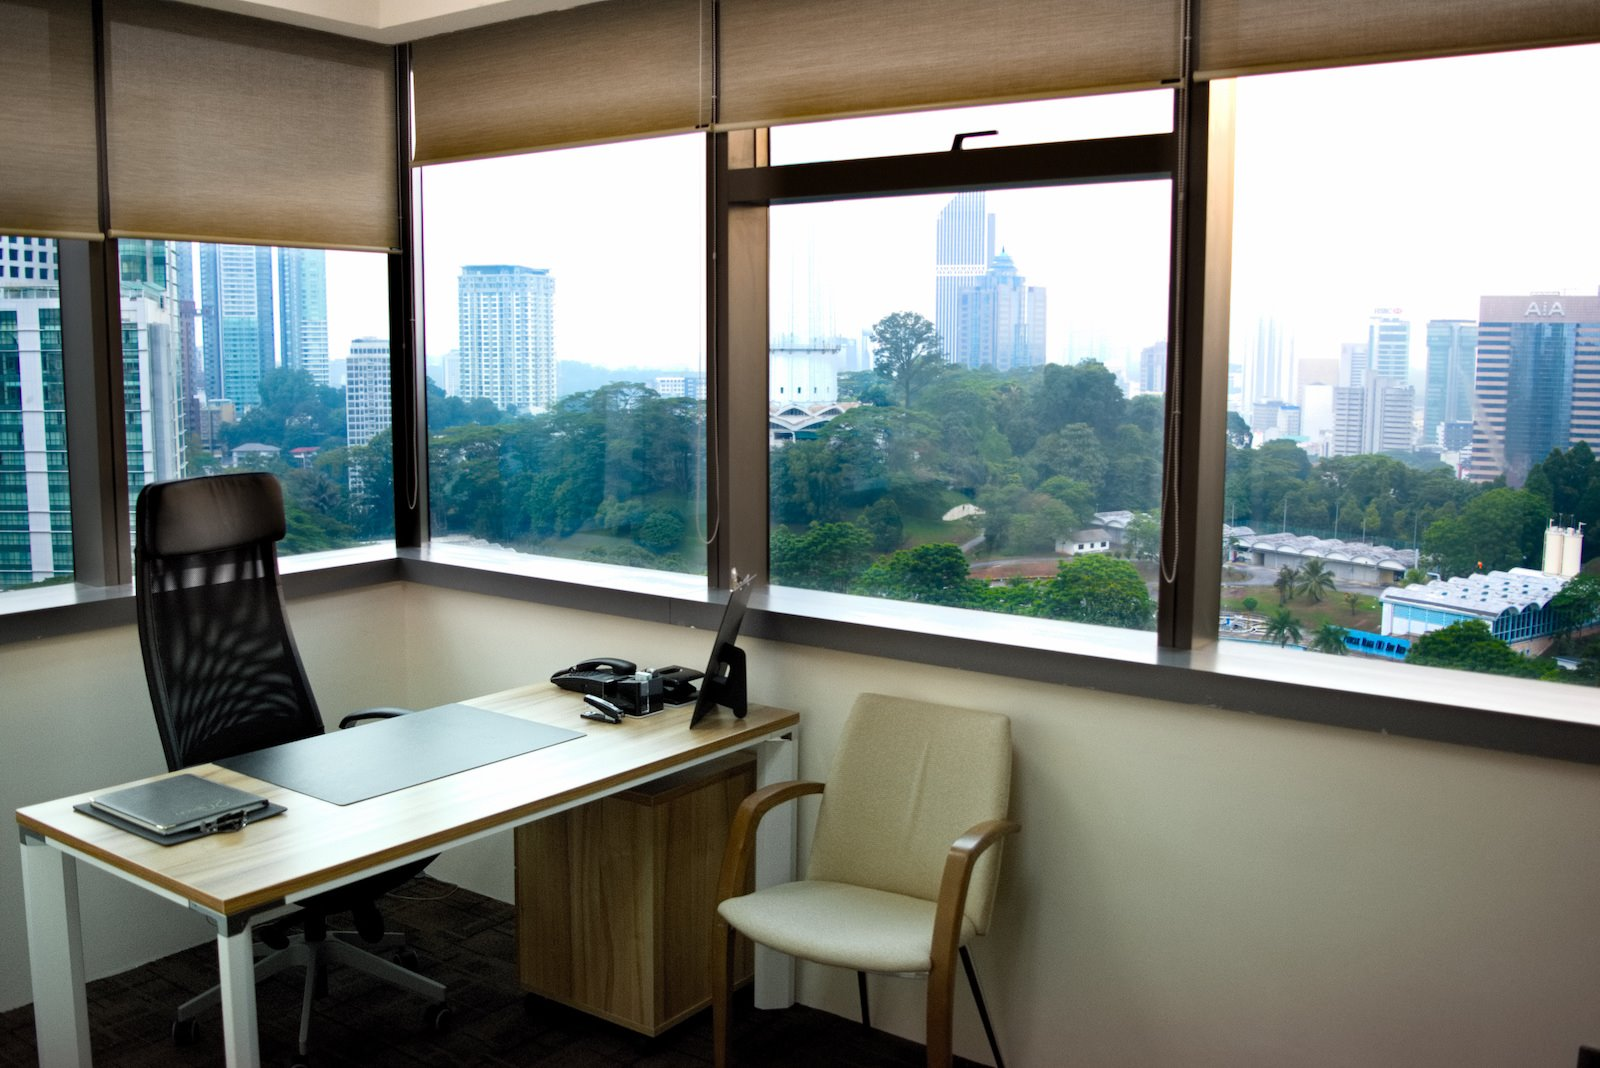 Kancelaria urbanistyczno-prawna